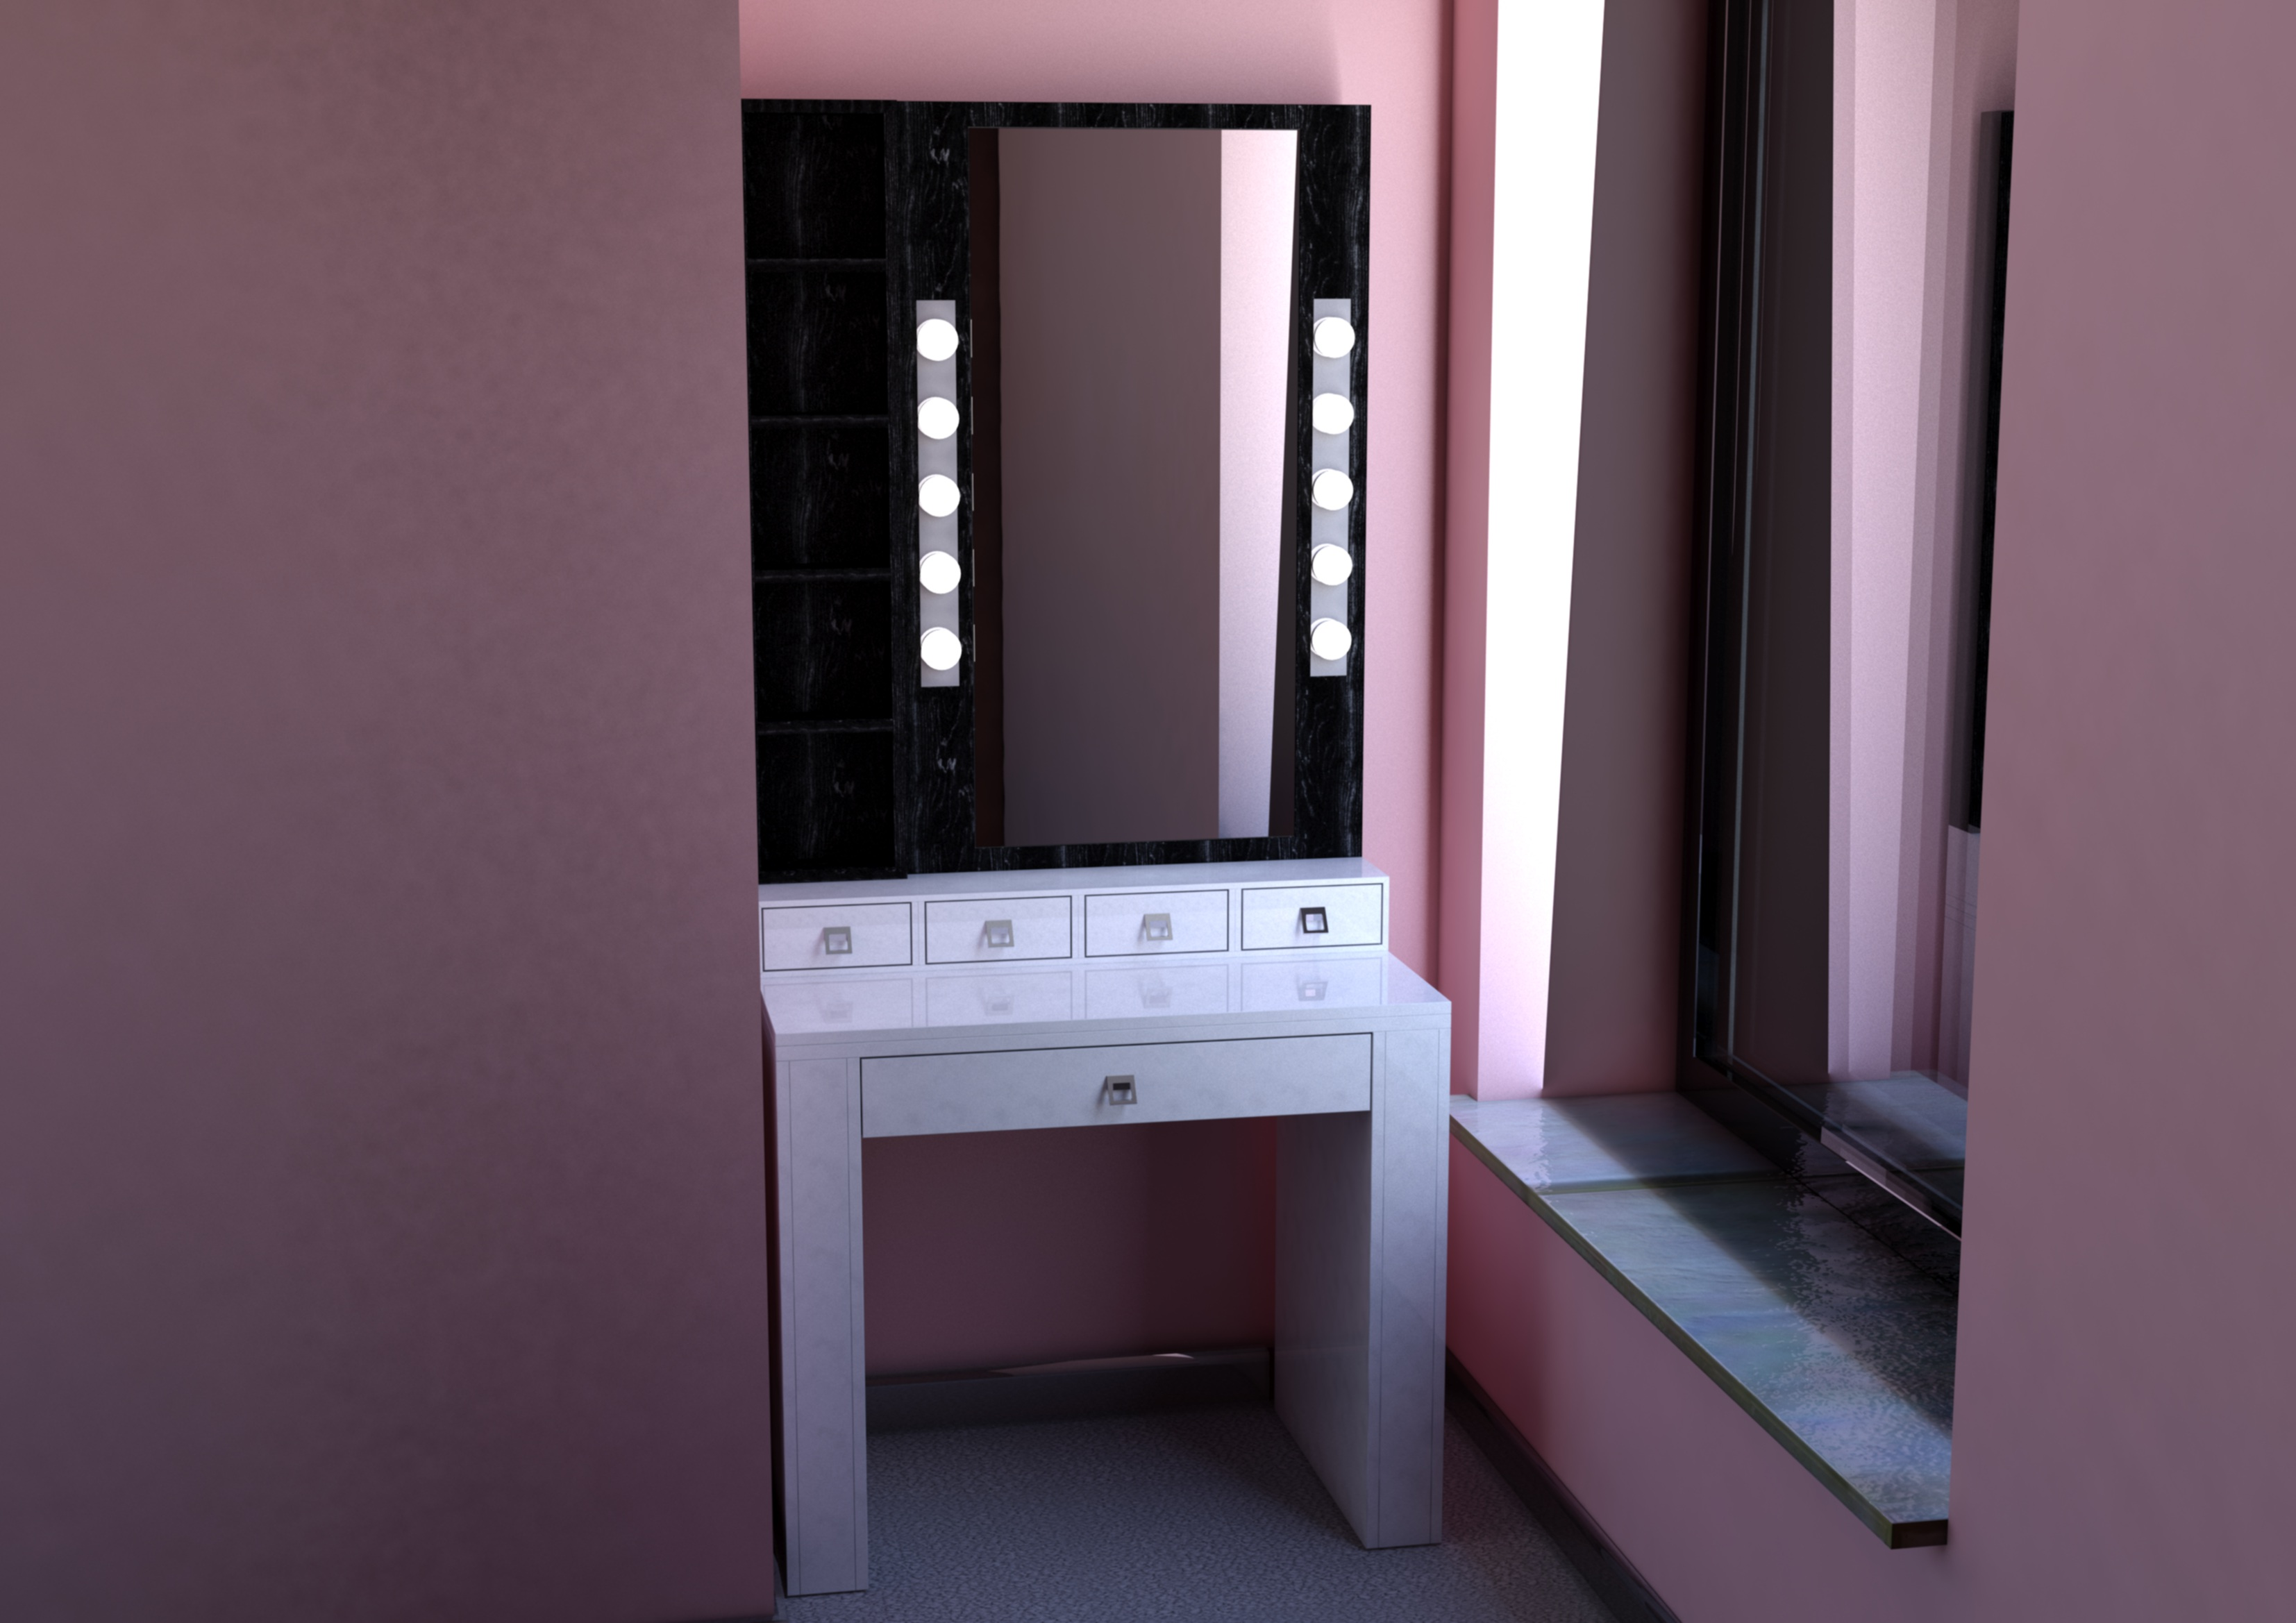 столик А3 формата.jpg